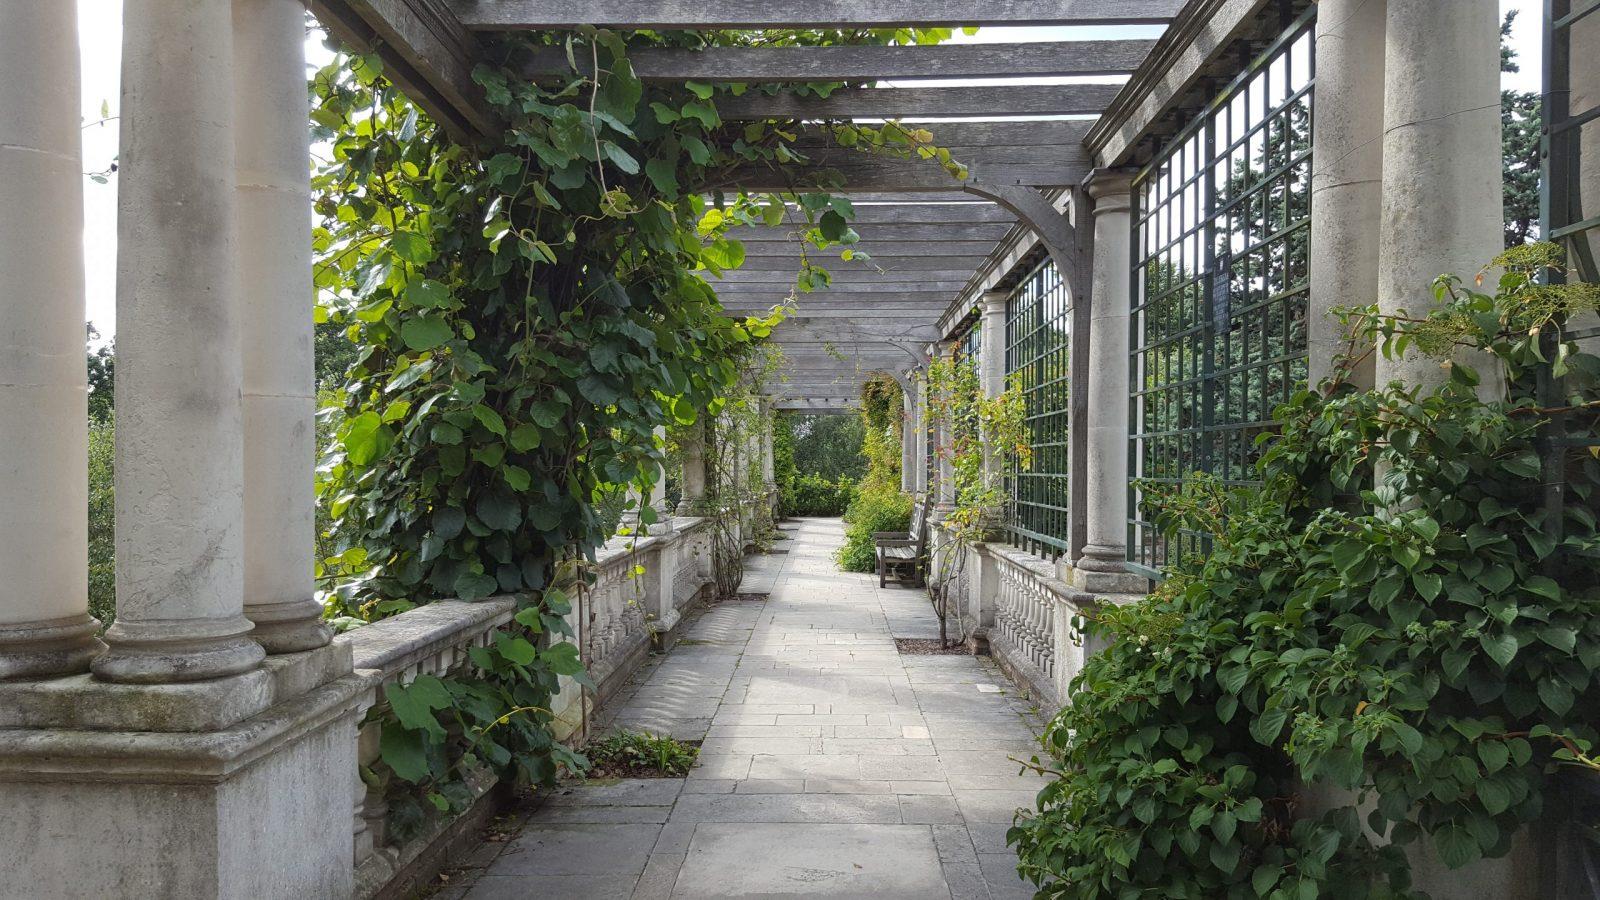 Visiting Hill Garden & Pergola, Hampstead Heath: Photo Gallery 12